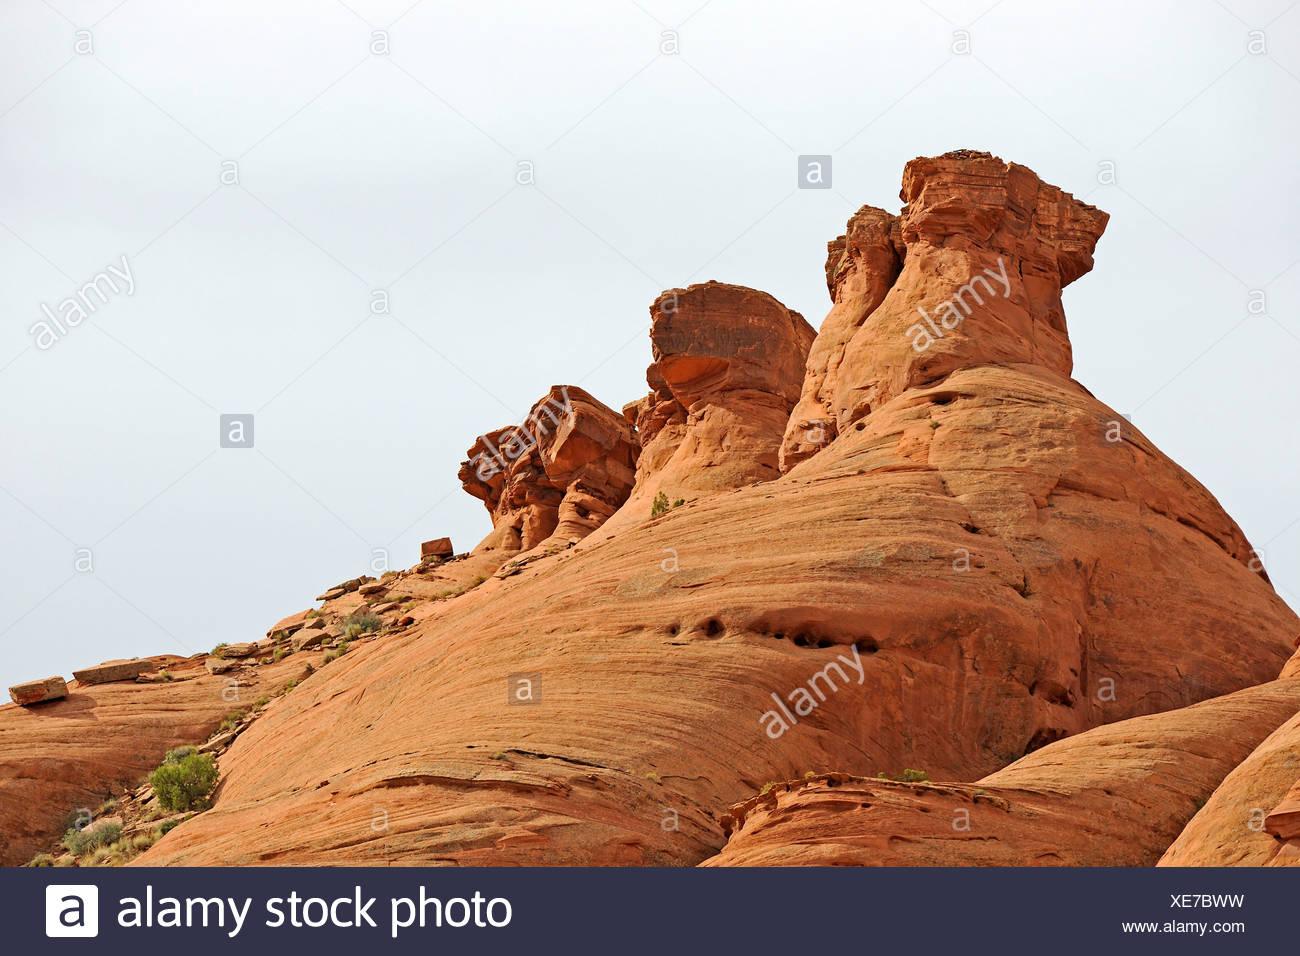 Rock formation, The Three Bears, Mystery Valley, Arizona, Southwest USA - Stock Image